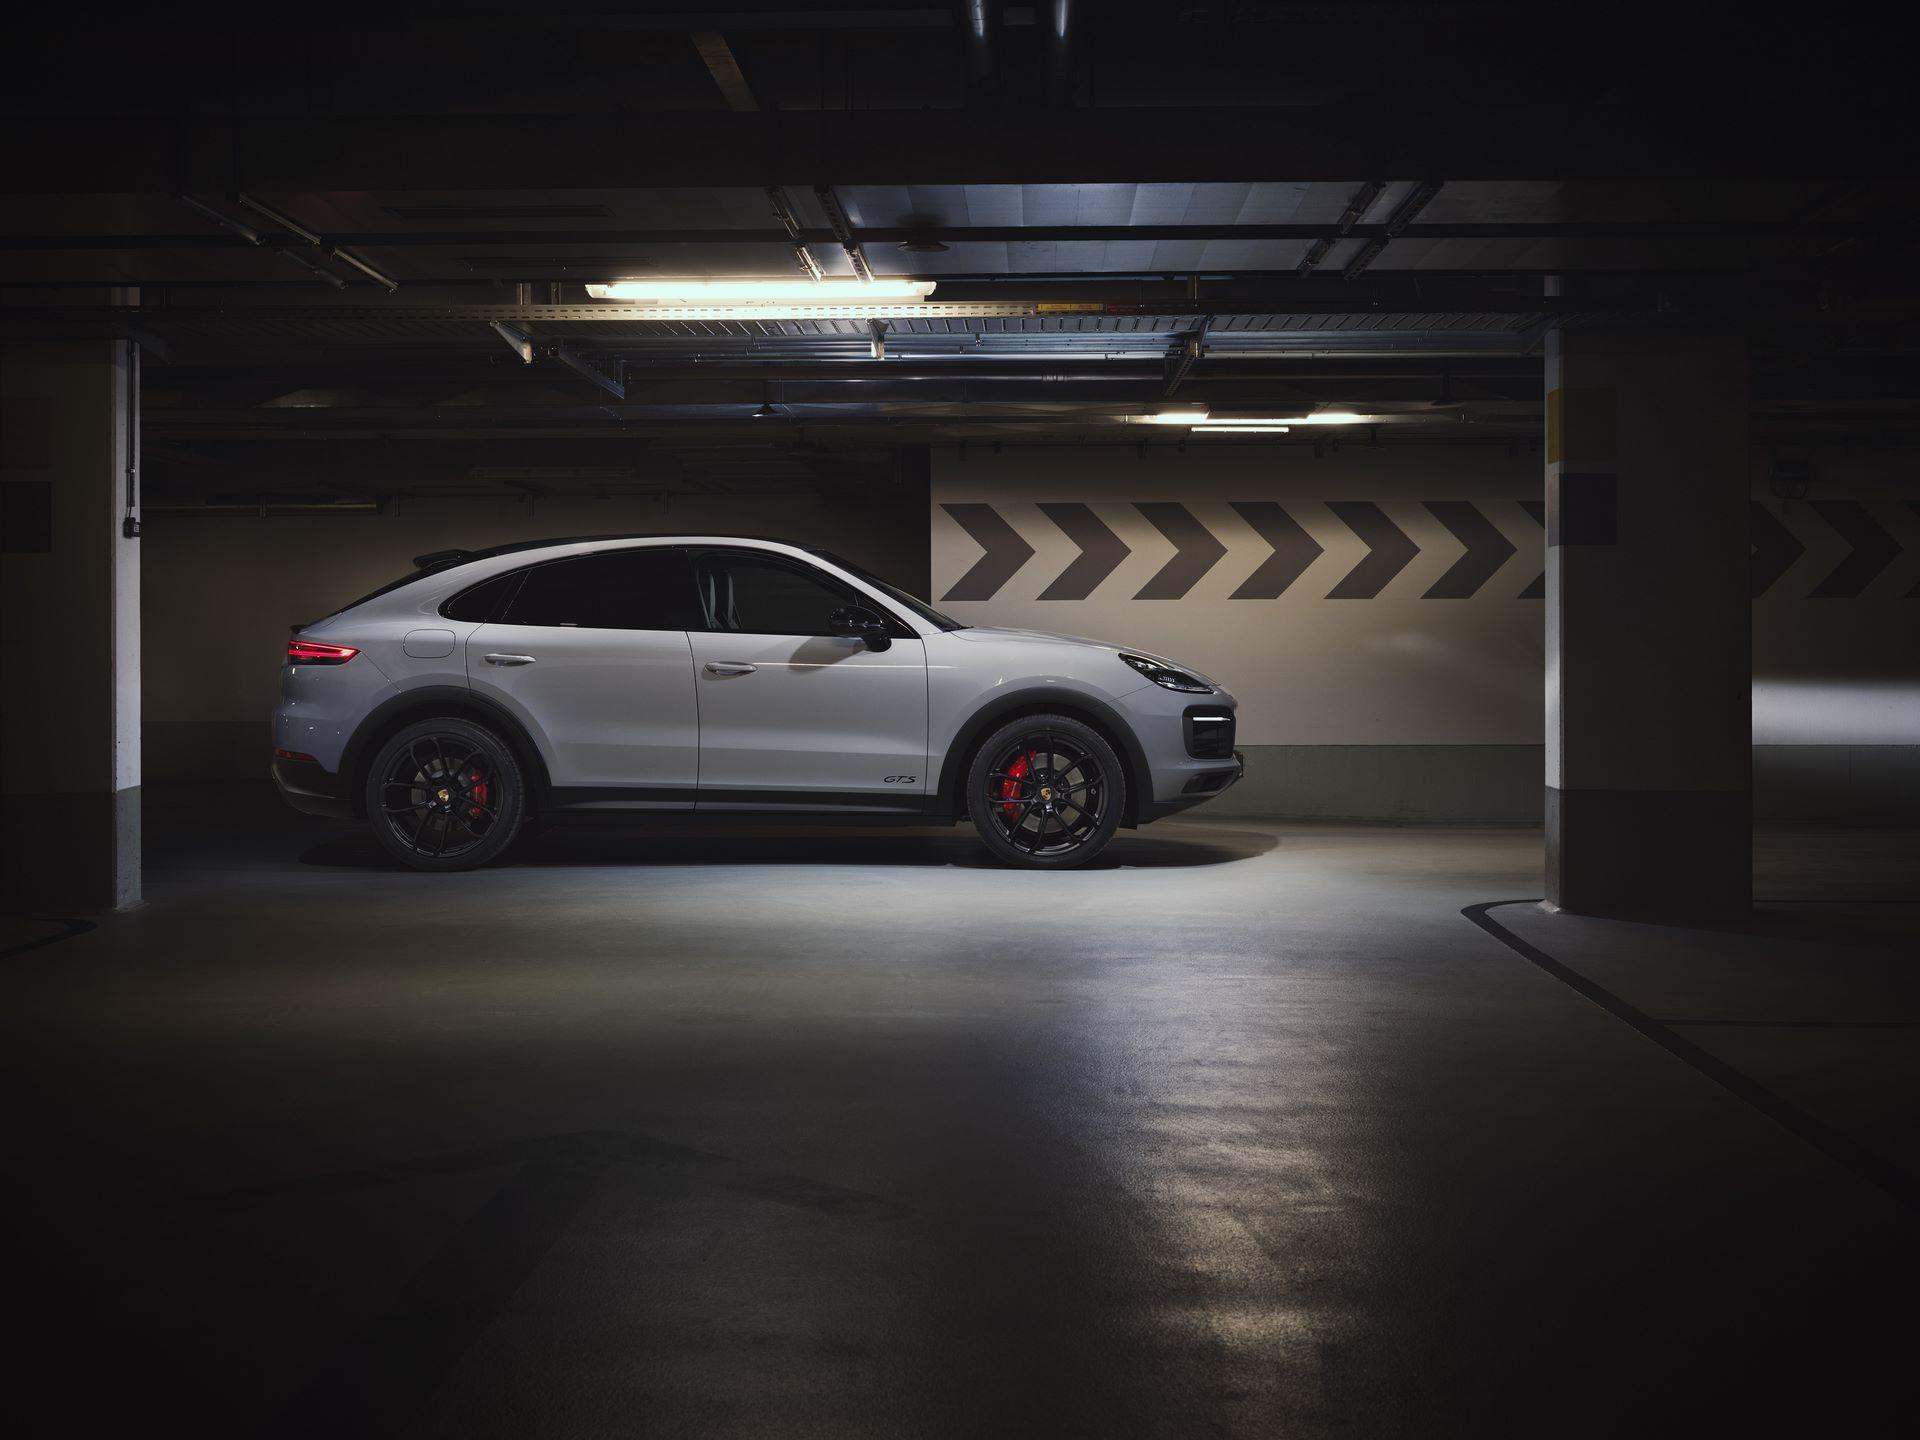 Porsche-Cayenne-GTS-and-Cayenne-GTS-Coupe-2021-3